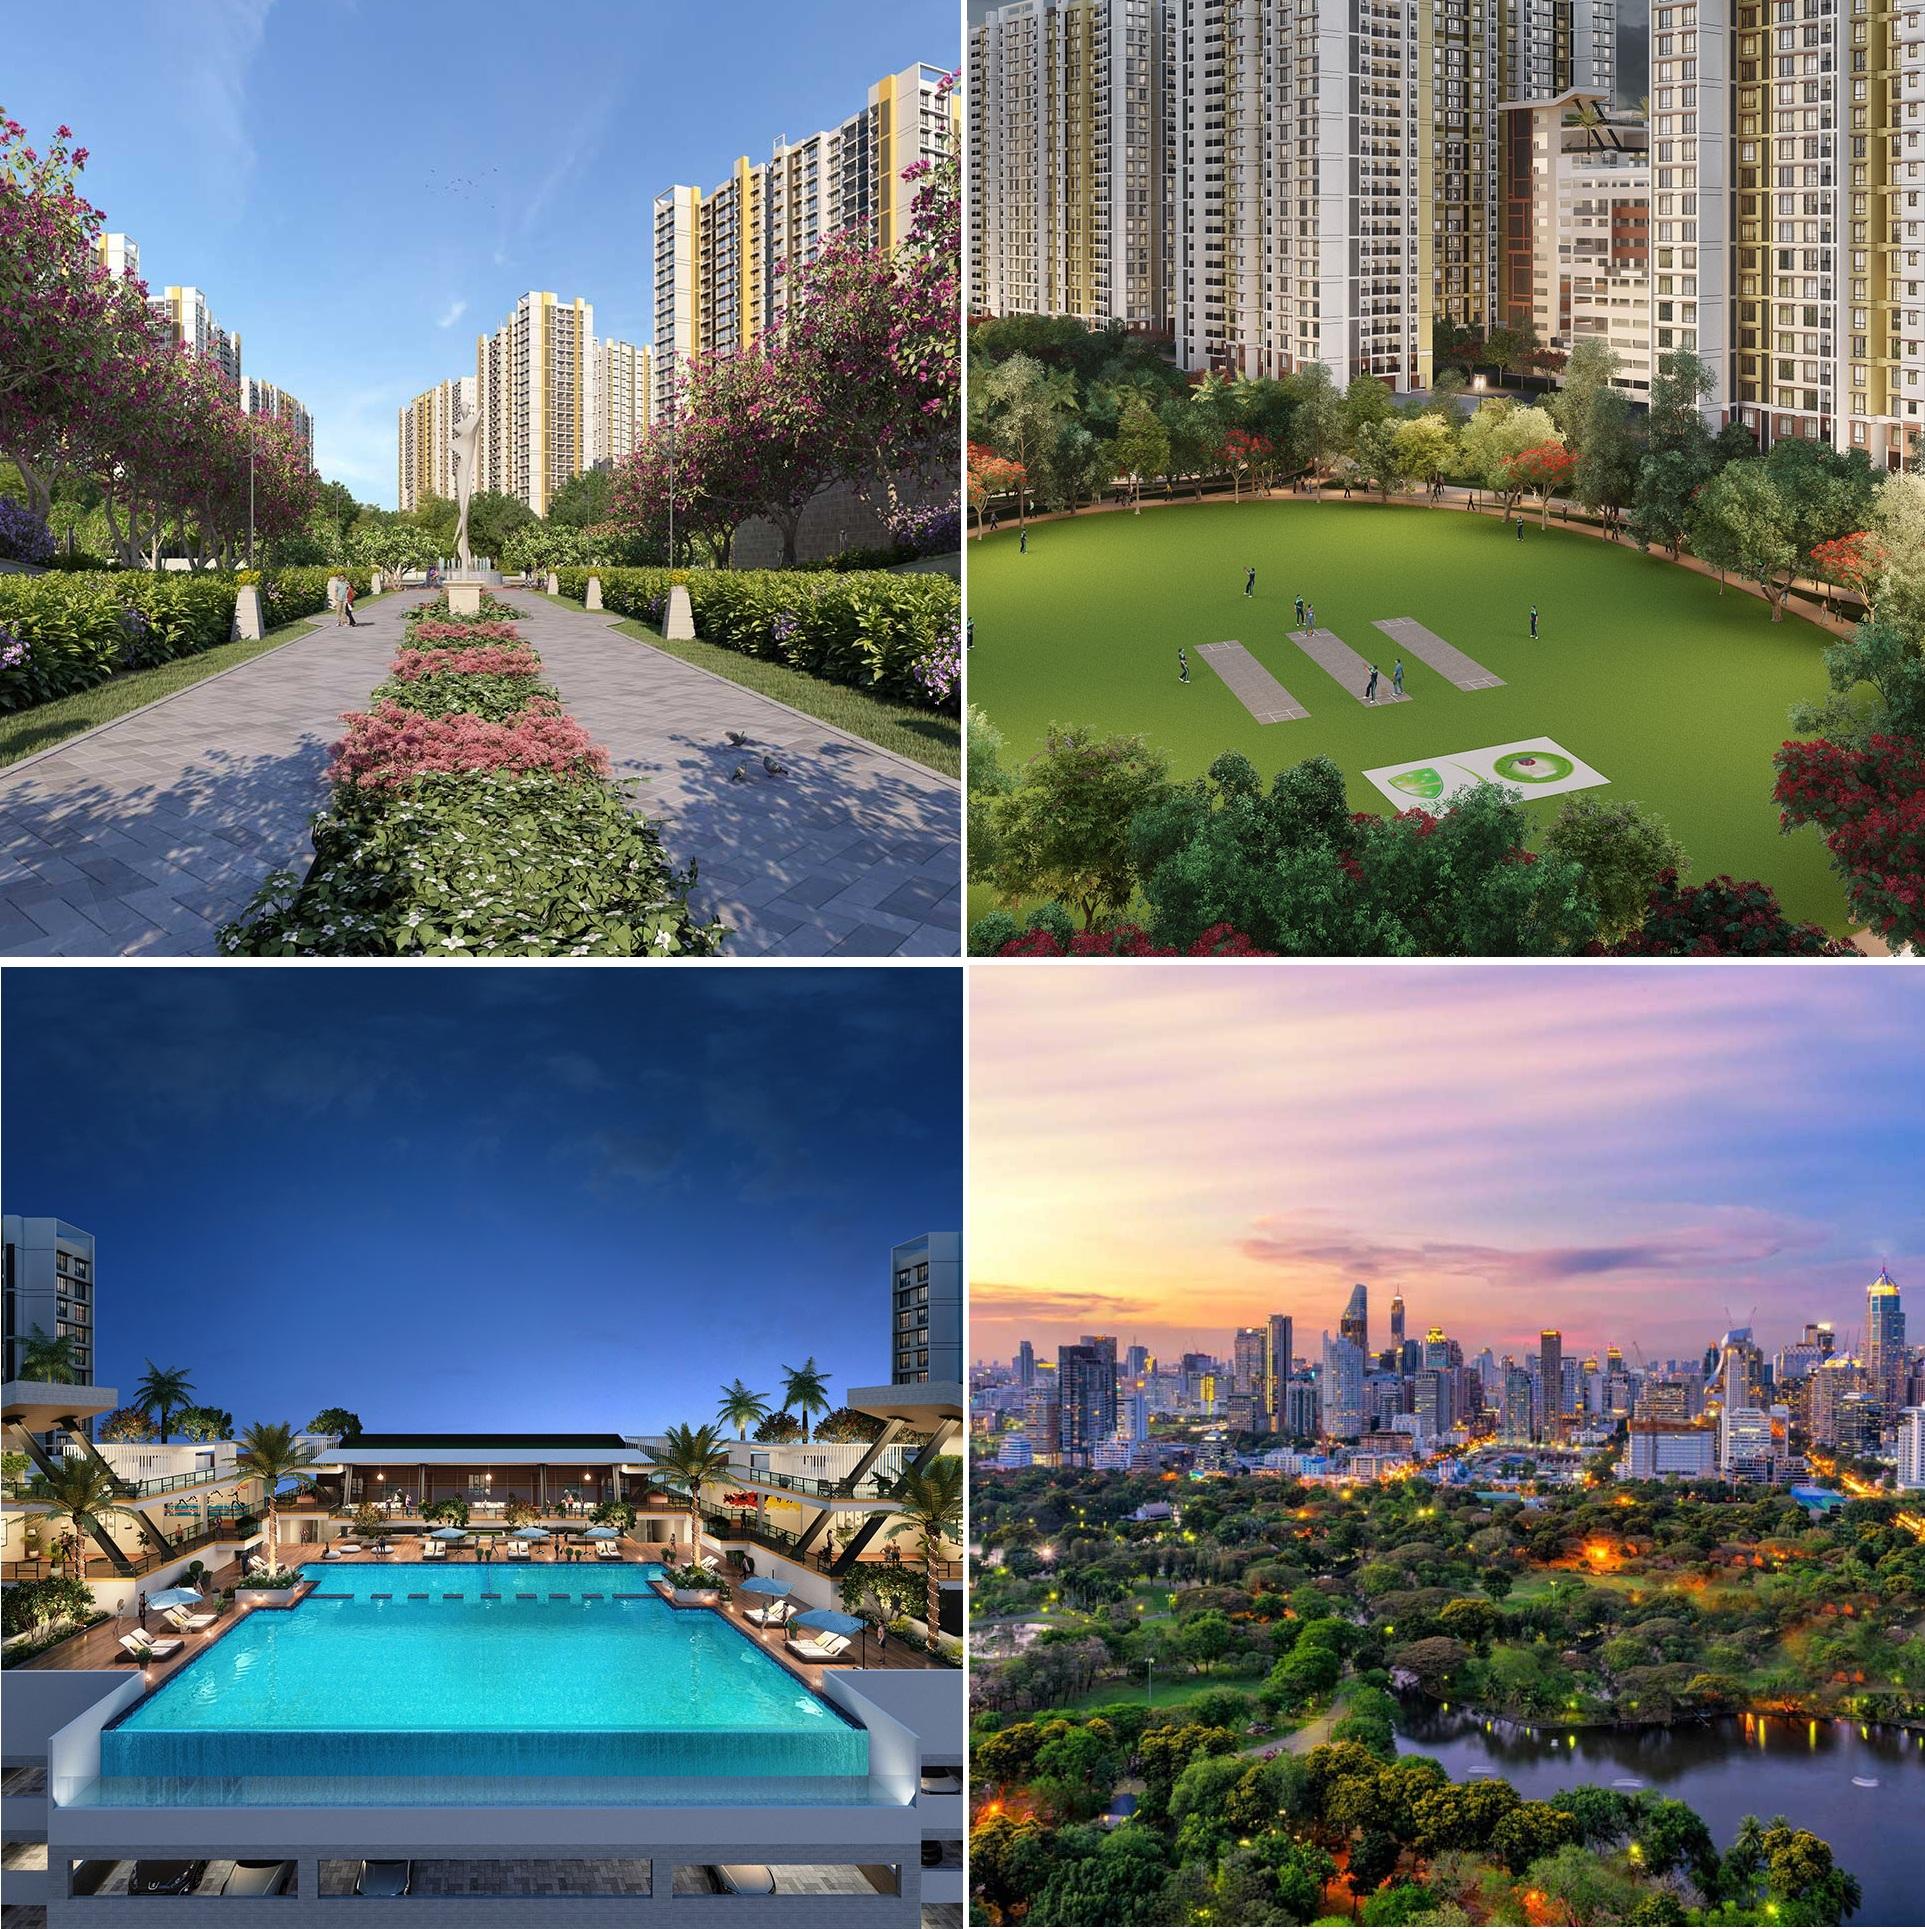 runwal gardens north avenue amenities features5